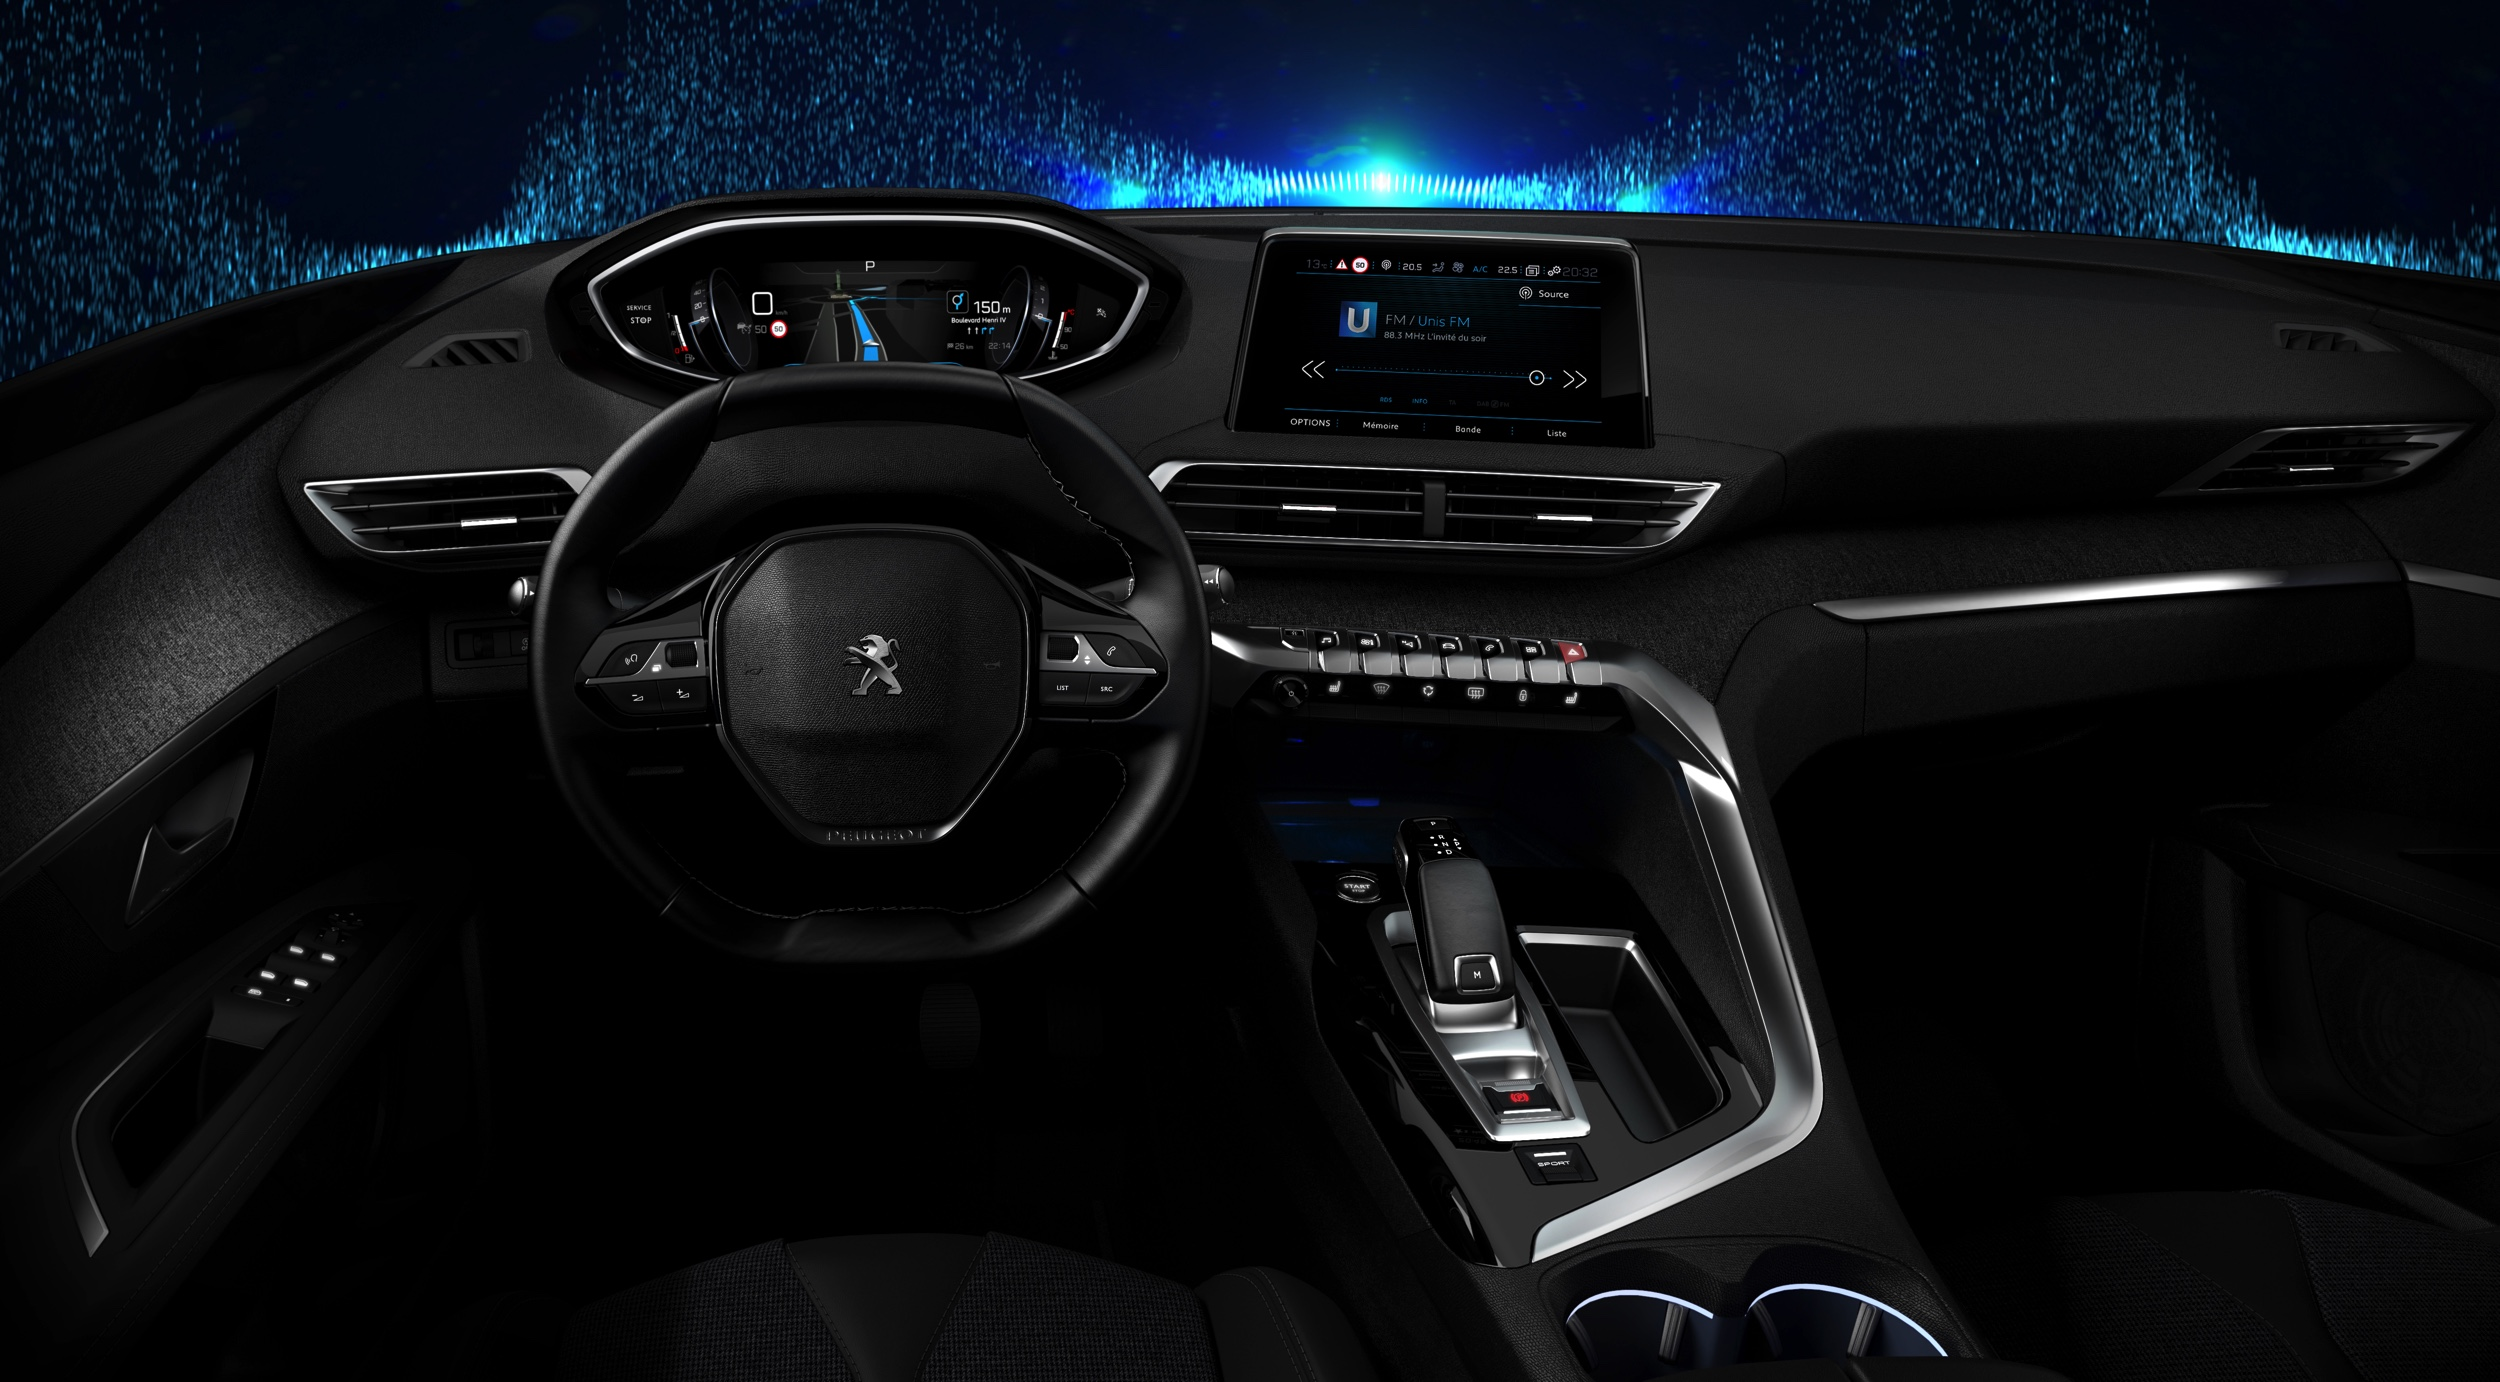 Peugeot i-Cockpit -3-Autovisie.nl